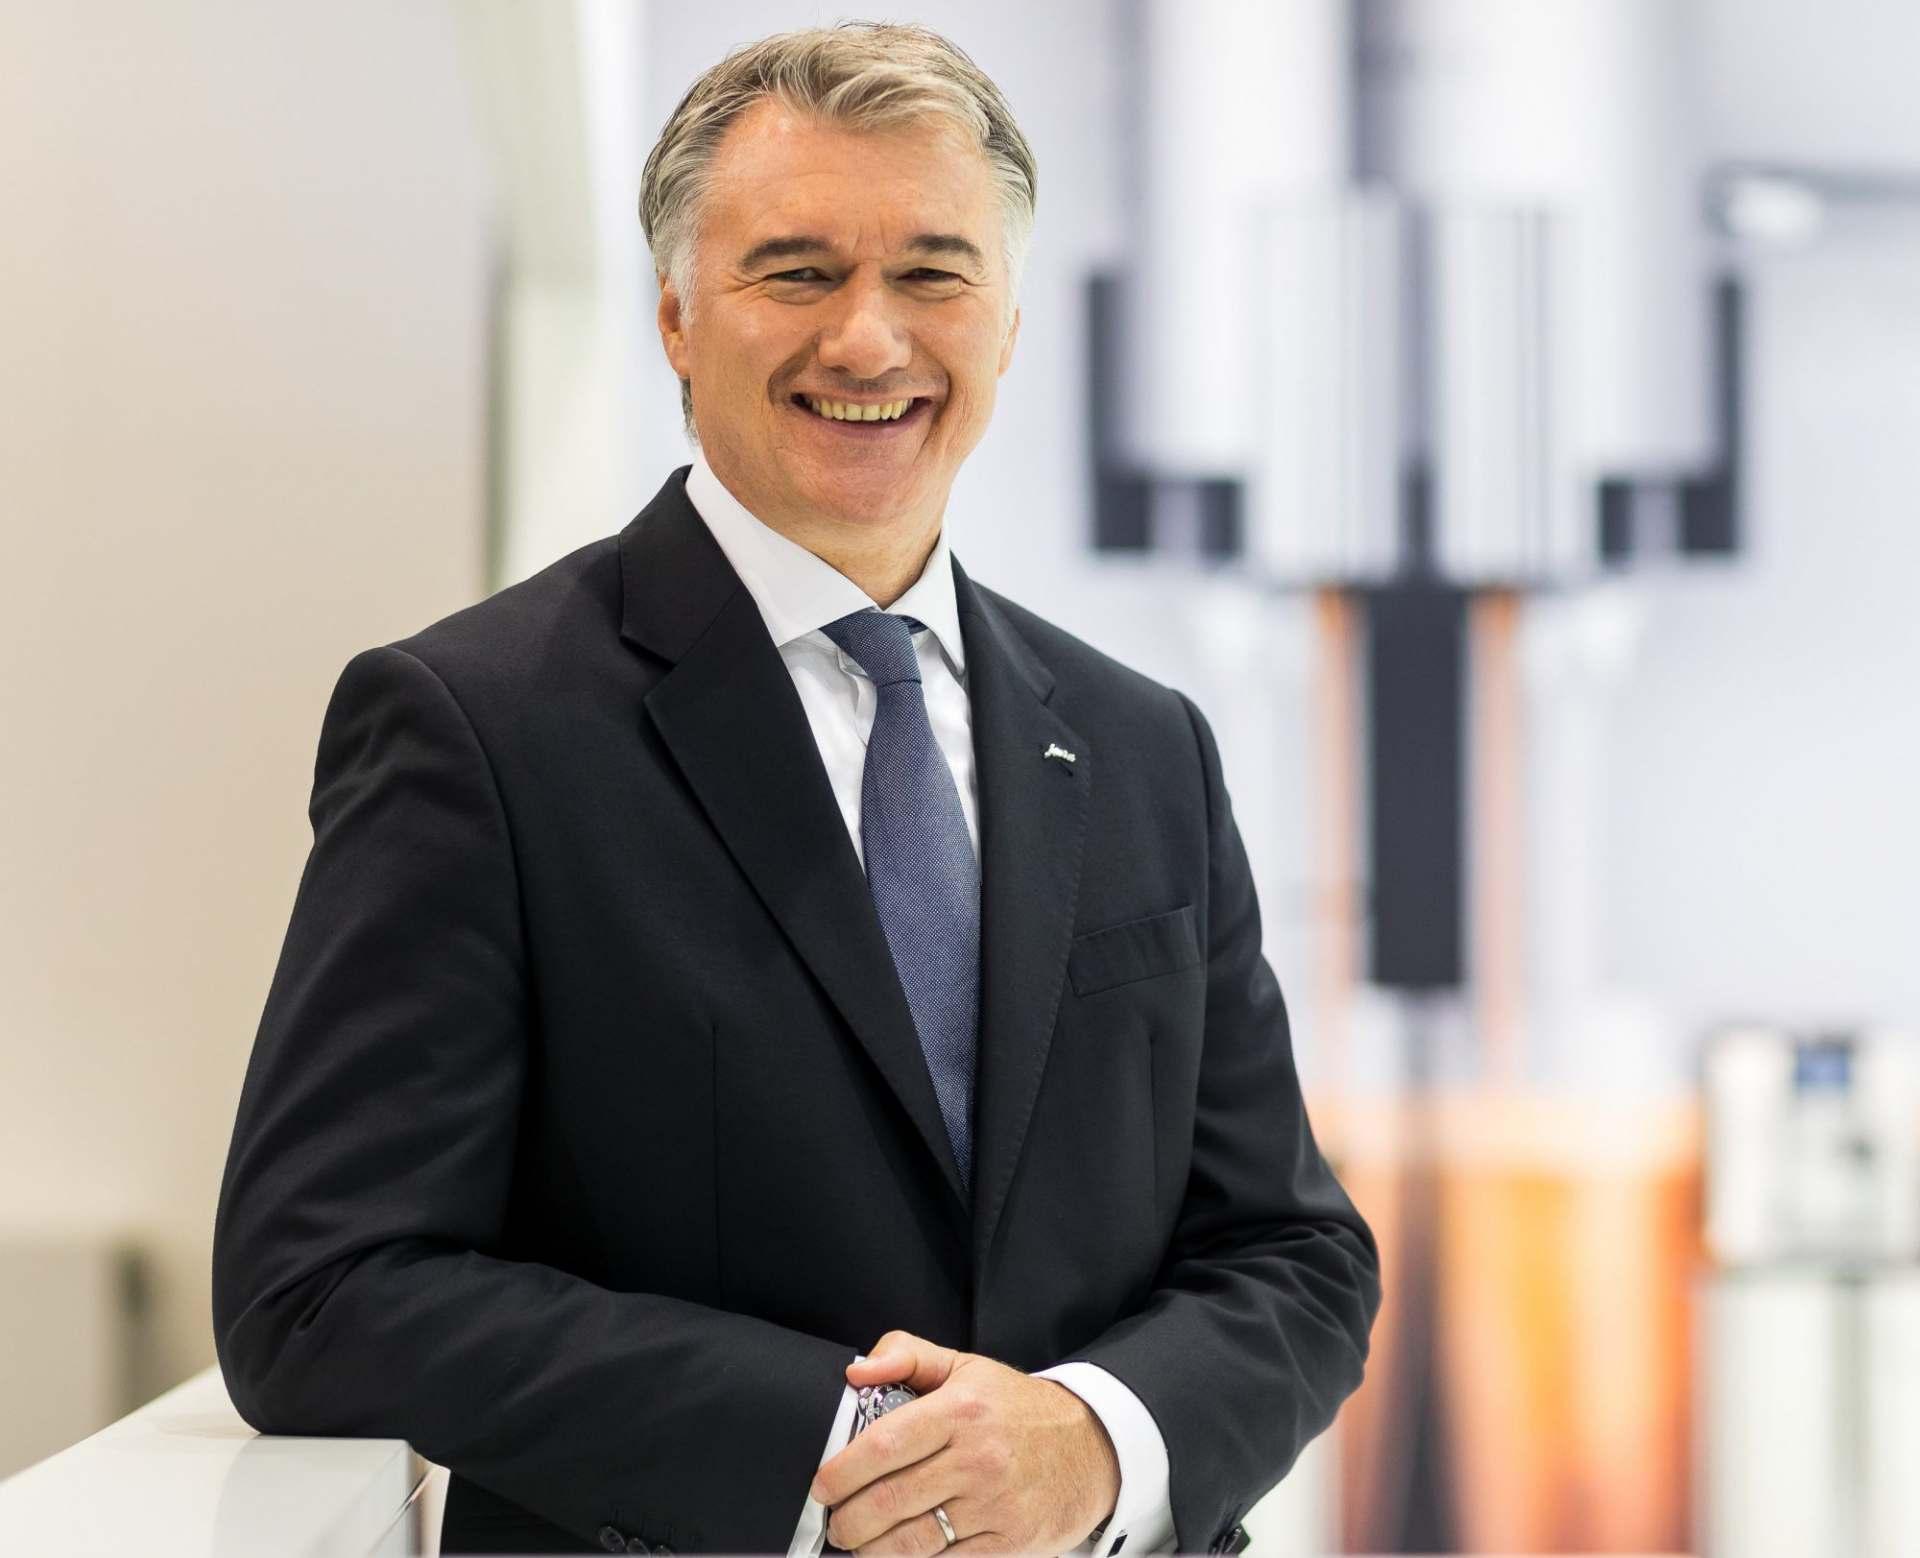 Host Nikolaus, Geschäftsführer der Jura Elektrogeräte Vertriebs-GmbH